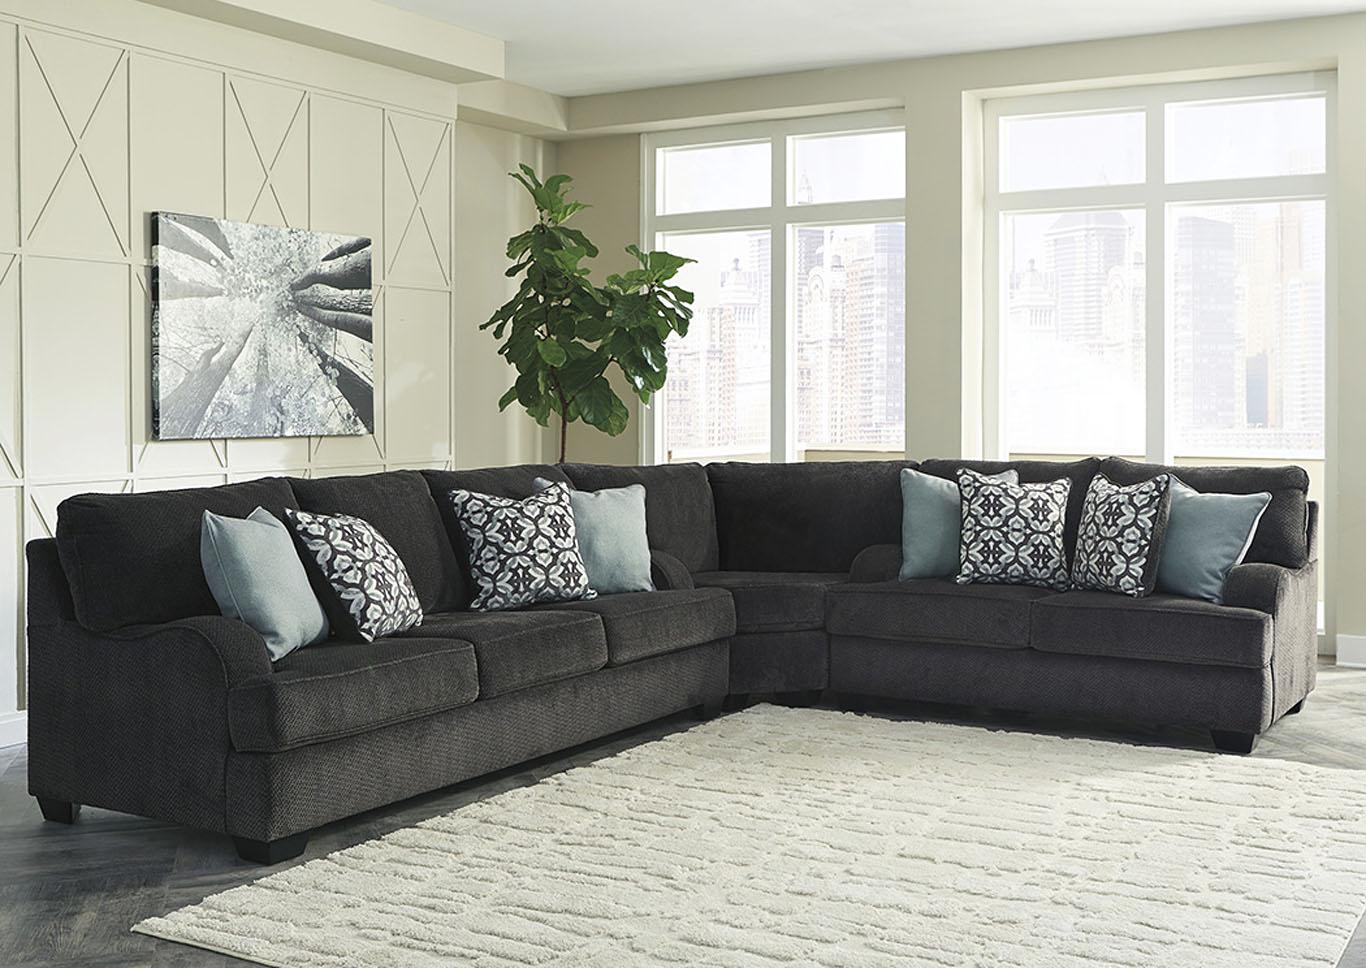 Utah Furniture Direct - Ogden, Utah Charenton Charcoal Sectional